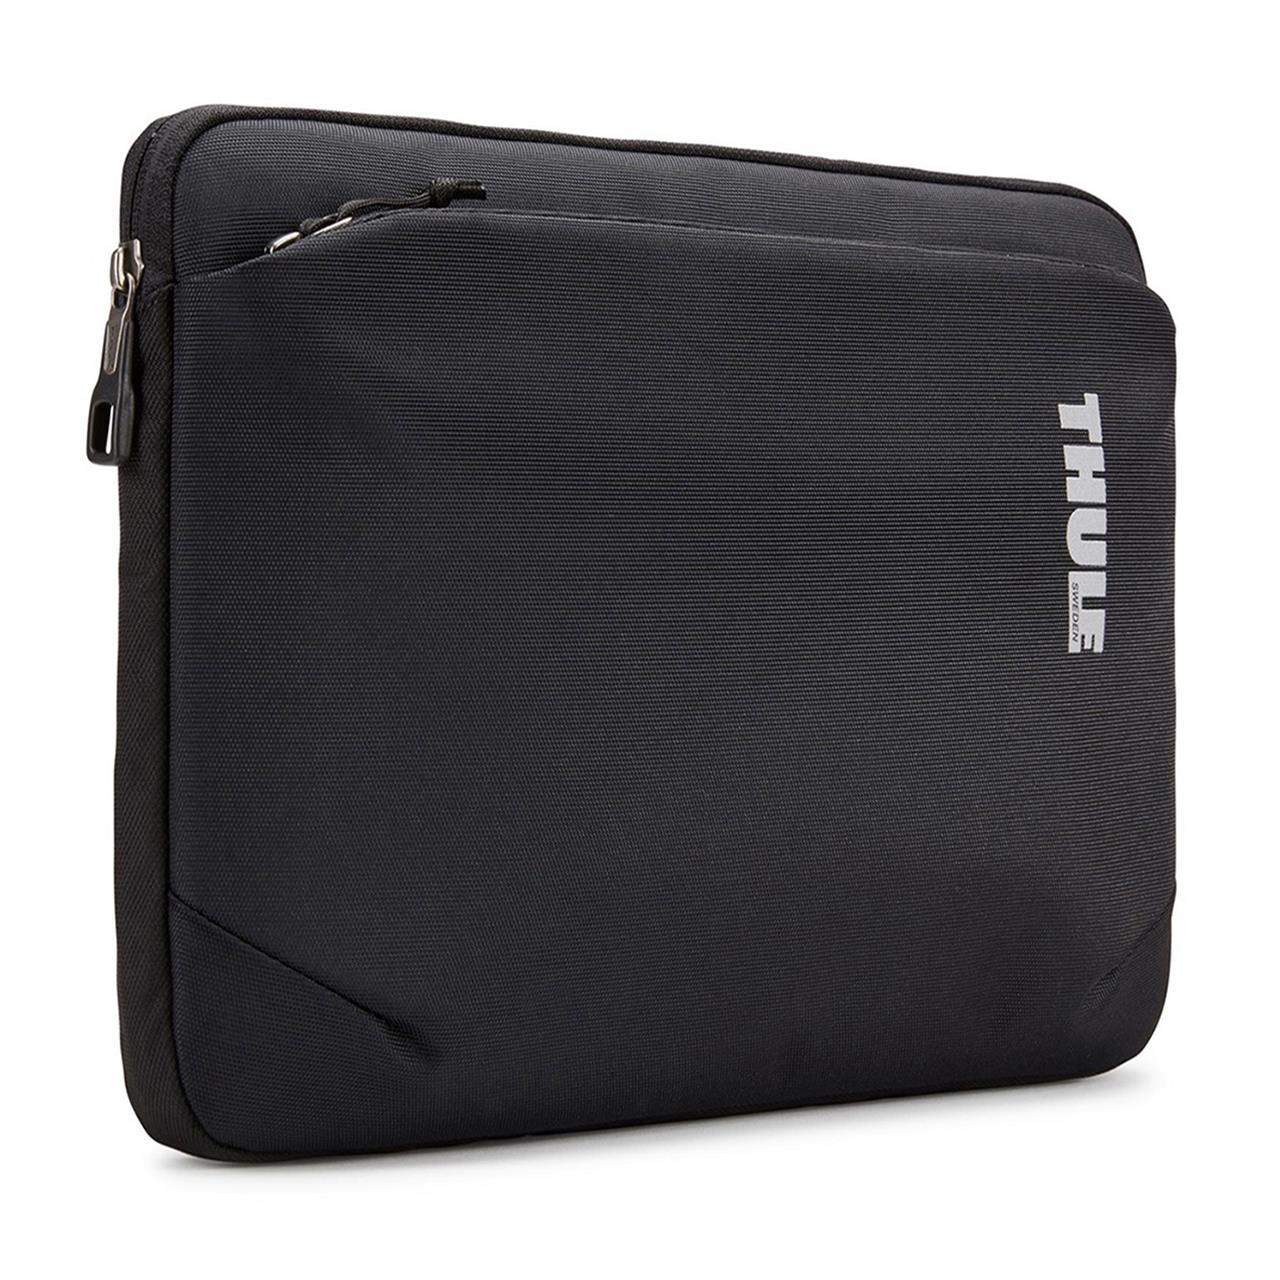 "Husa laptop Thule Subterra MacBook Air/Pro/Pro Retina Sleeve 13"" Black"